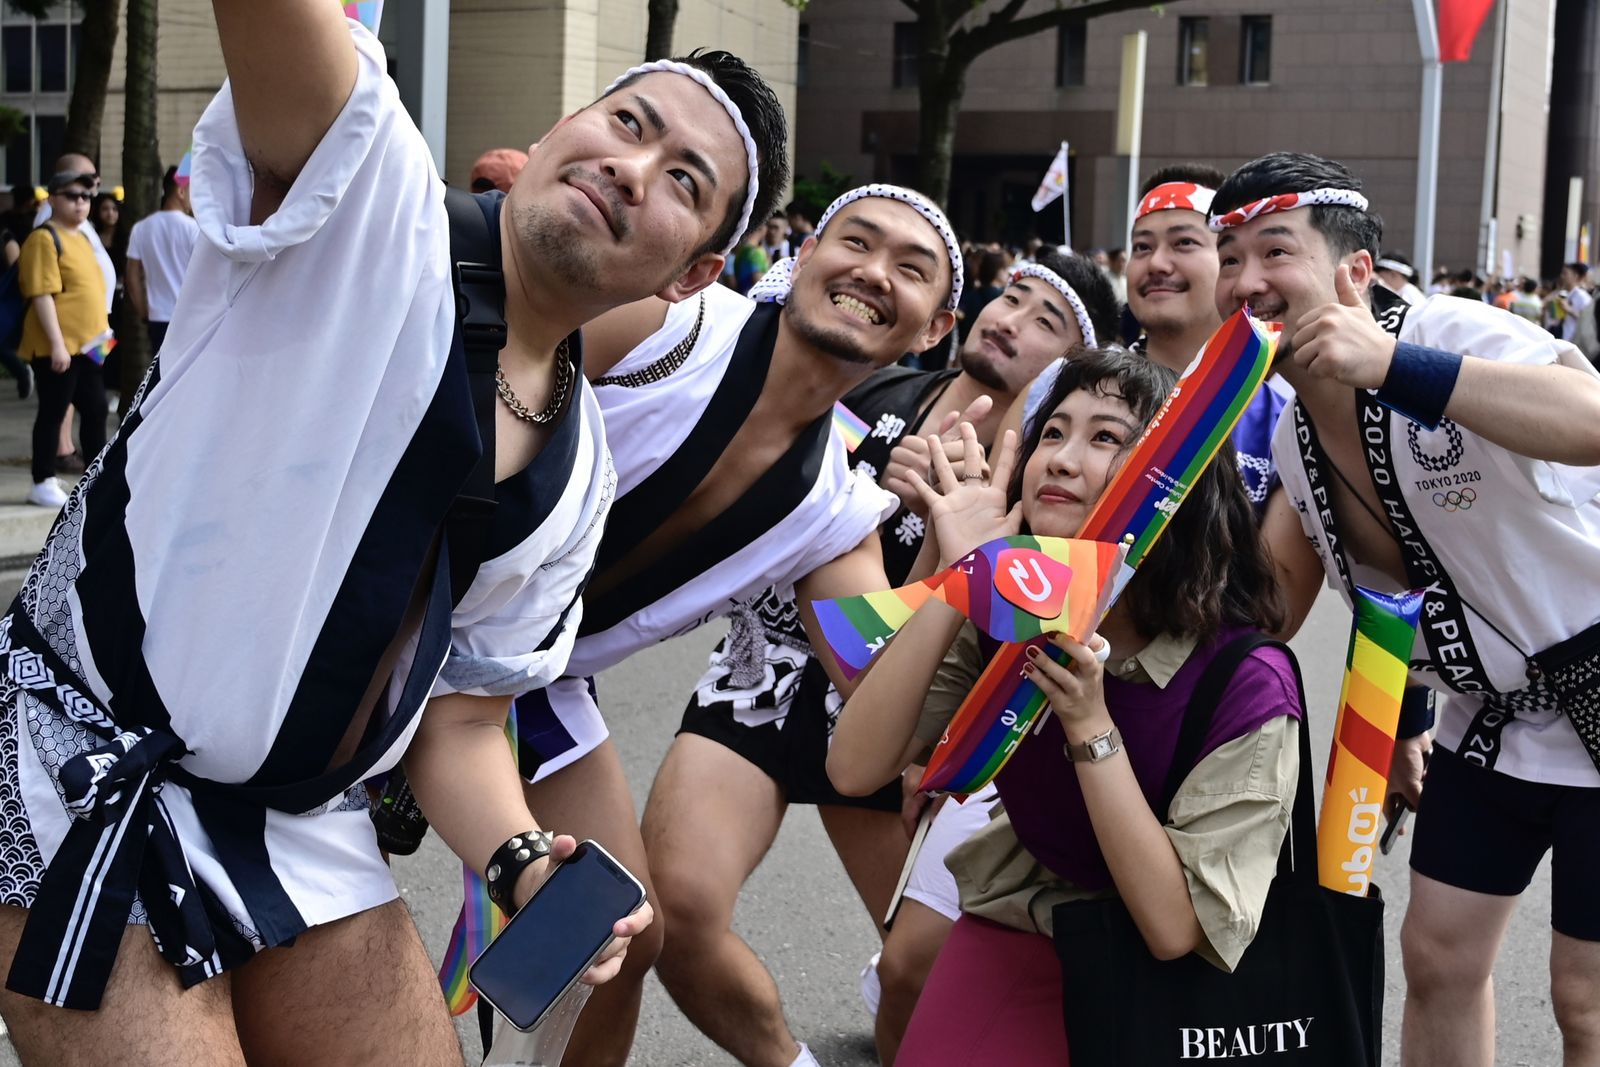 TAIWAN-LGBT-PRIDE-PARADE